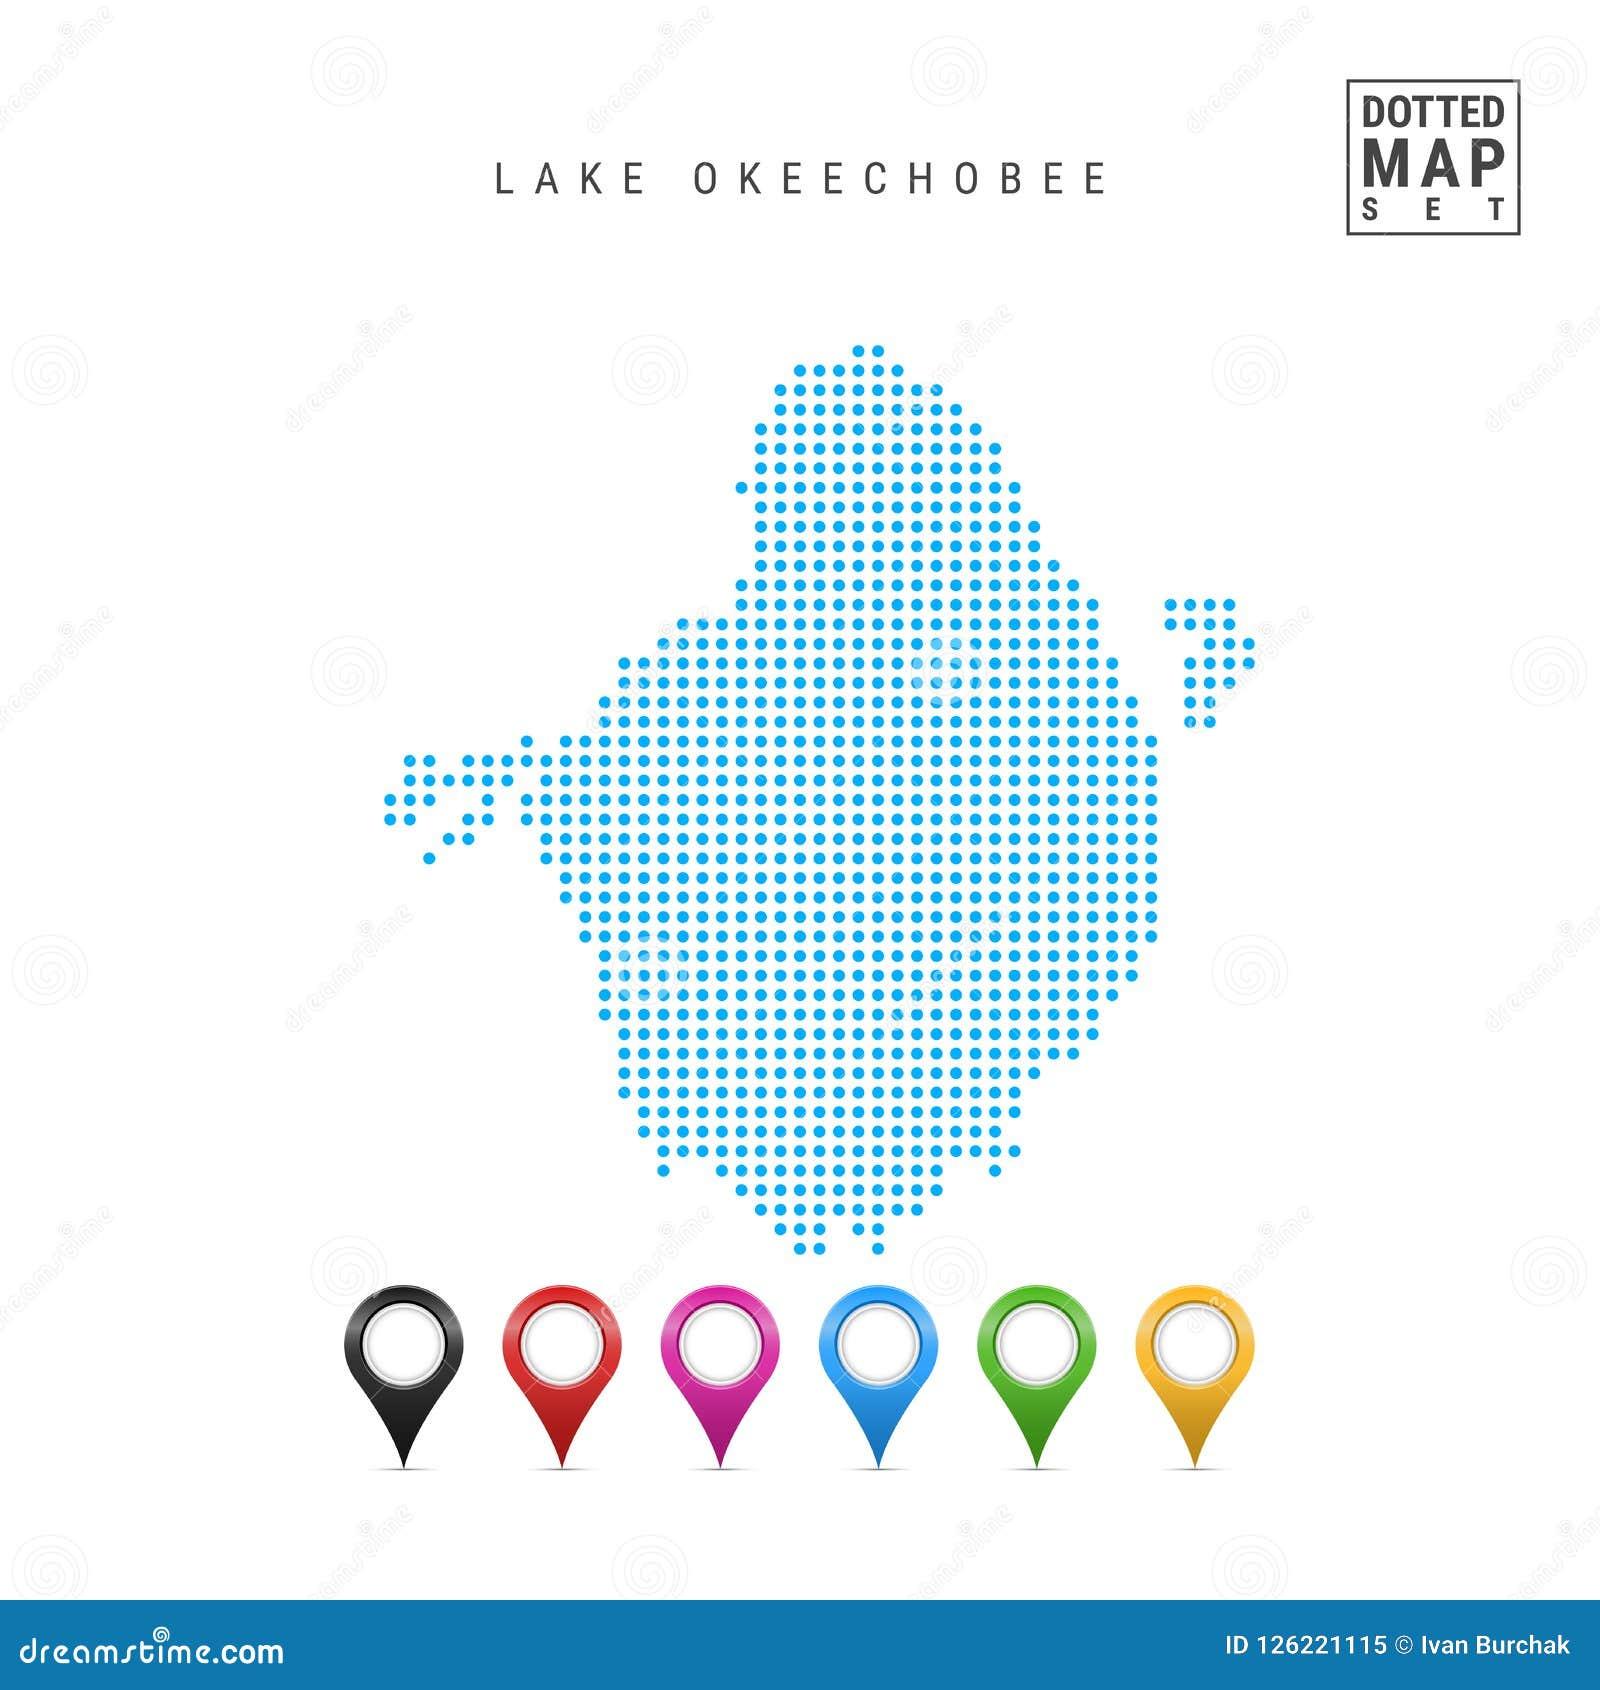 Lake Okeechobee Florida Dots Pattern Vector Map Stylized